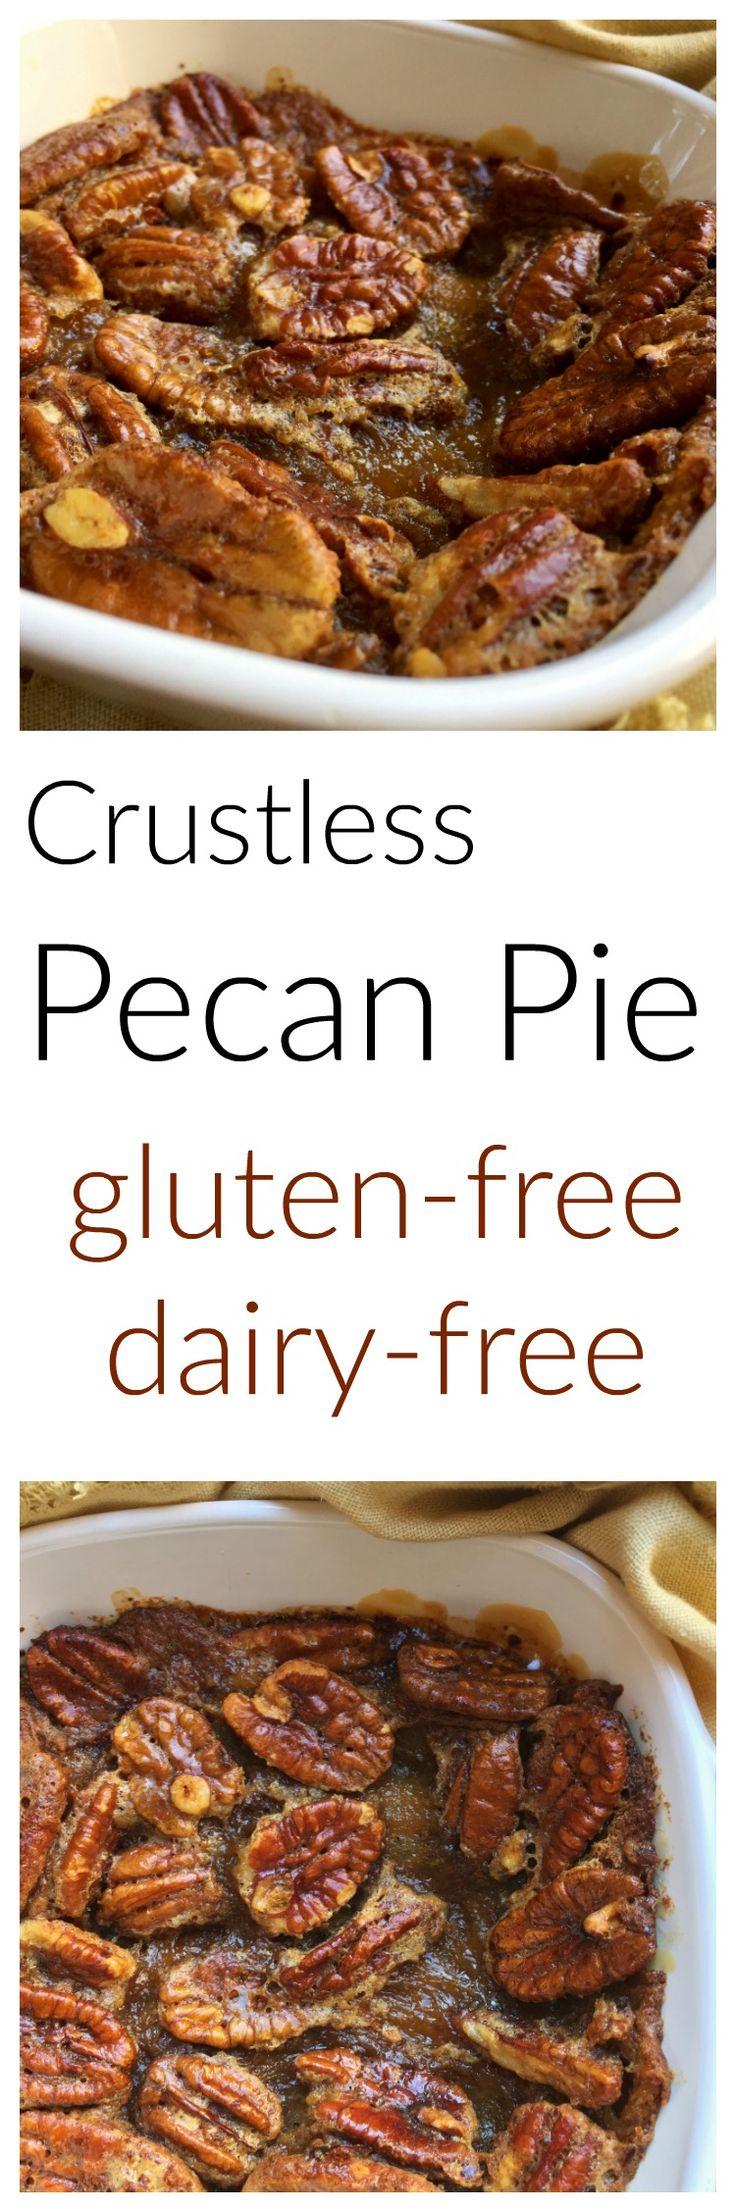 Crustless pecan pie